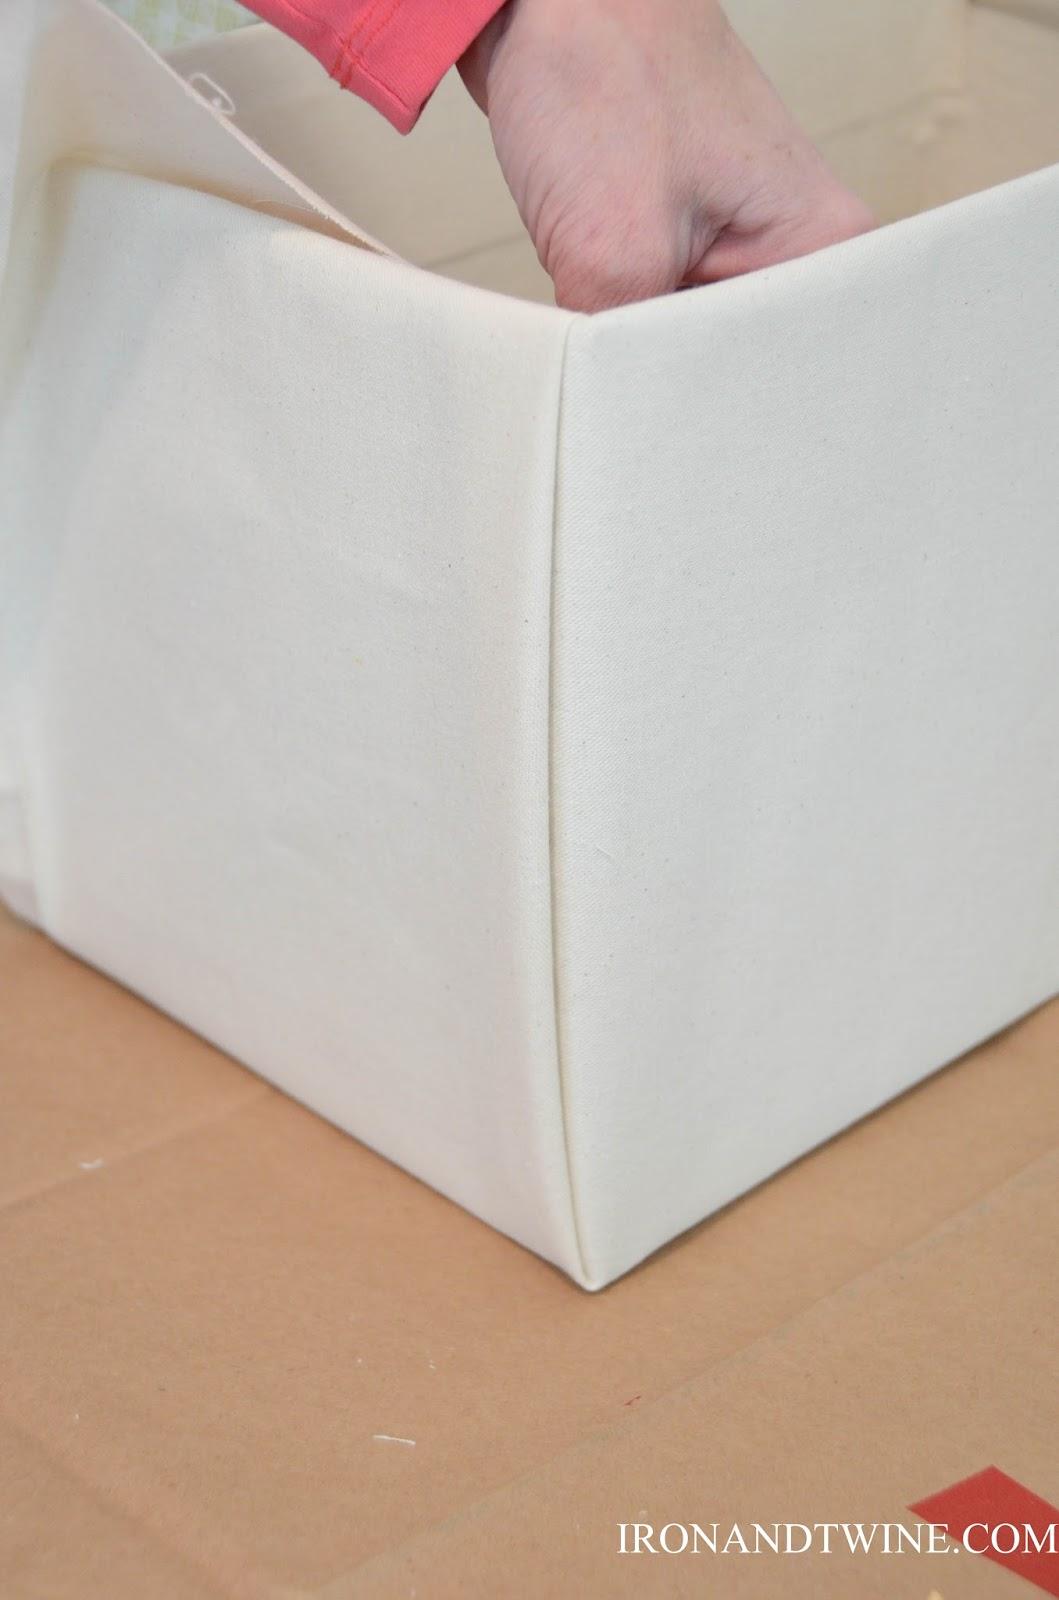 DIY+Belt+Handled+Box,+DIY+fabric+covered+box,+Iron+and+Twine+(28).jpg